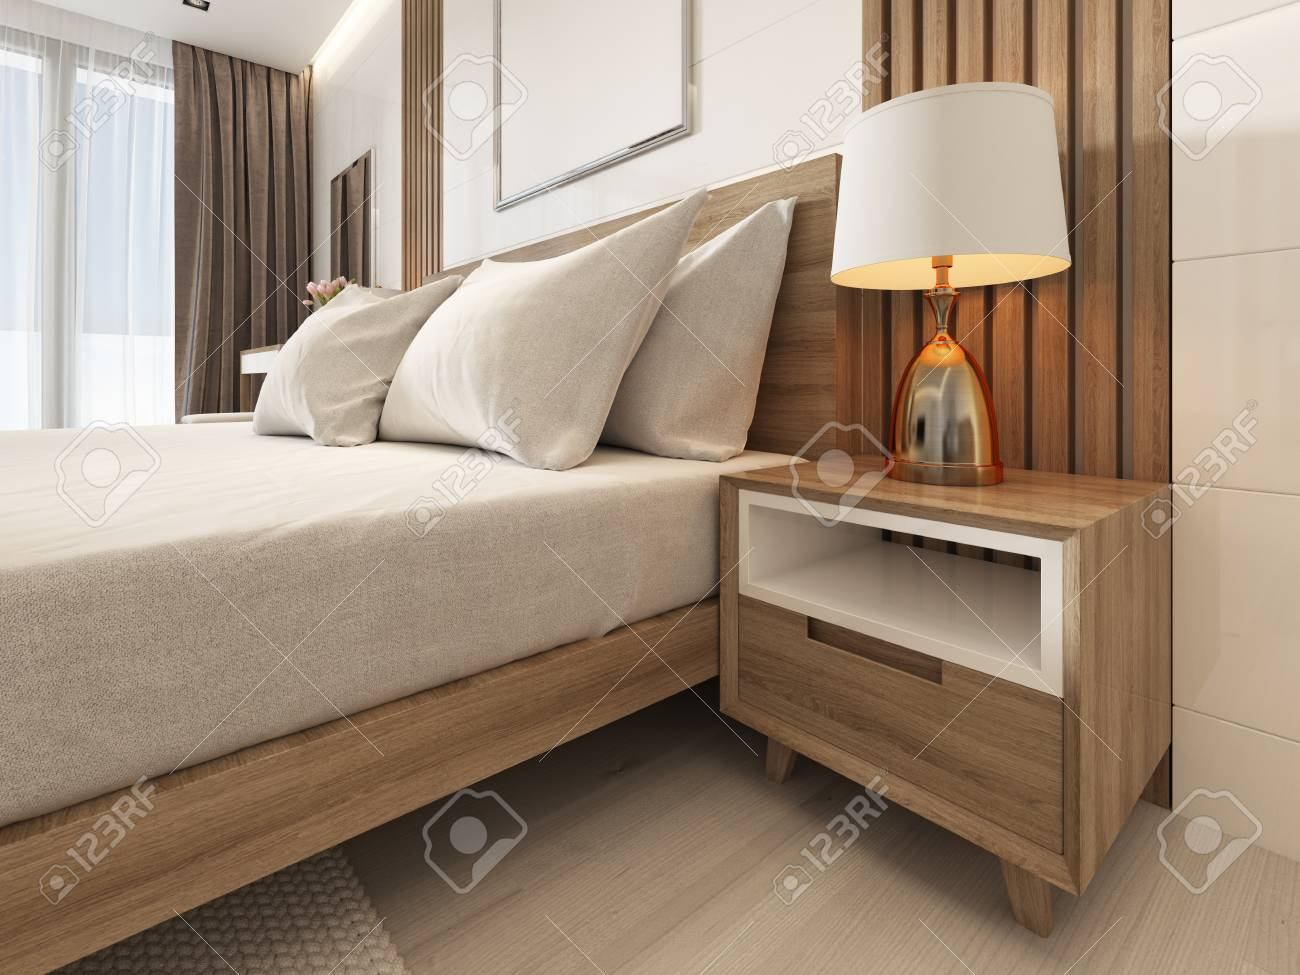 bedside table with a lamp in scandinavian bedroom. 3D rendering